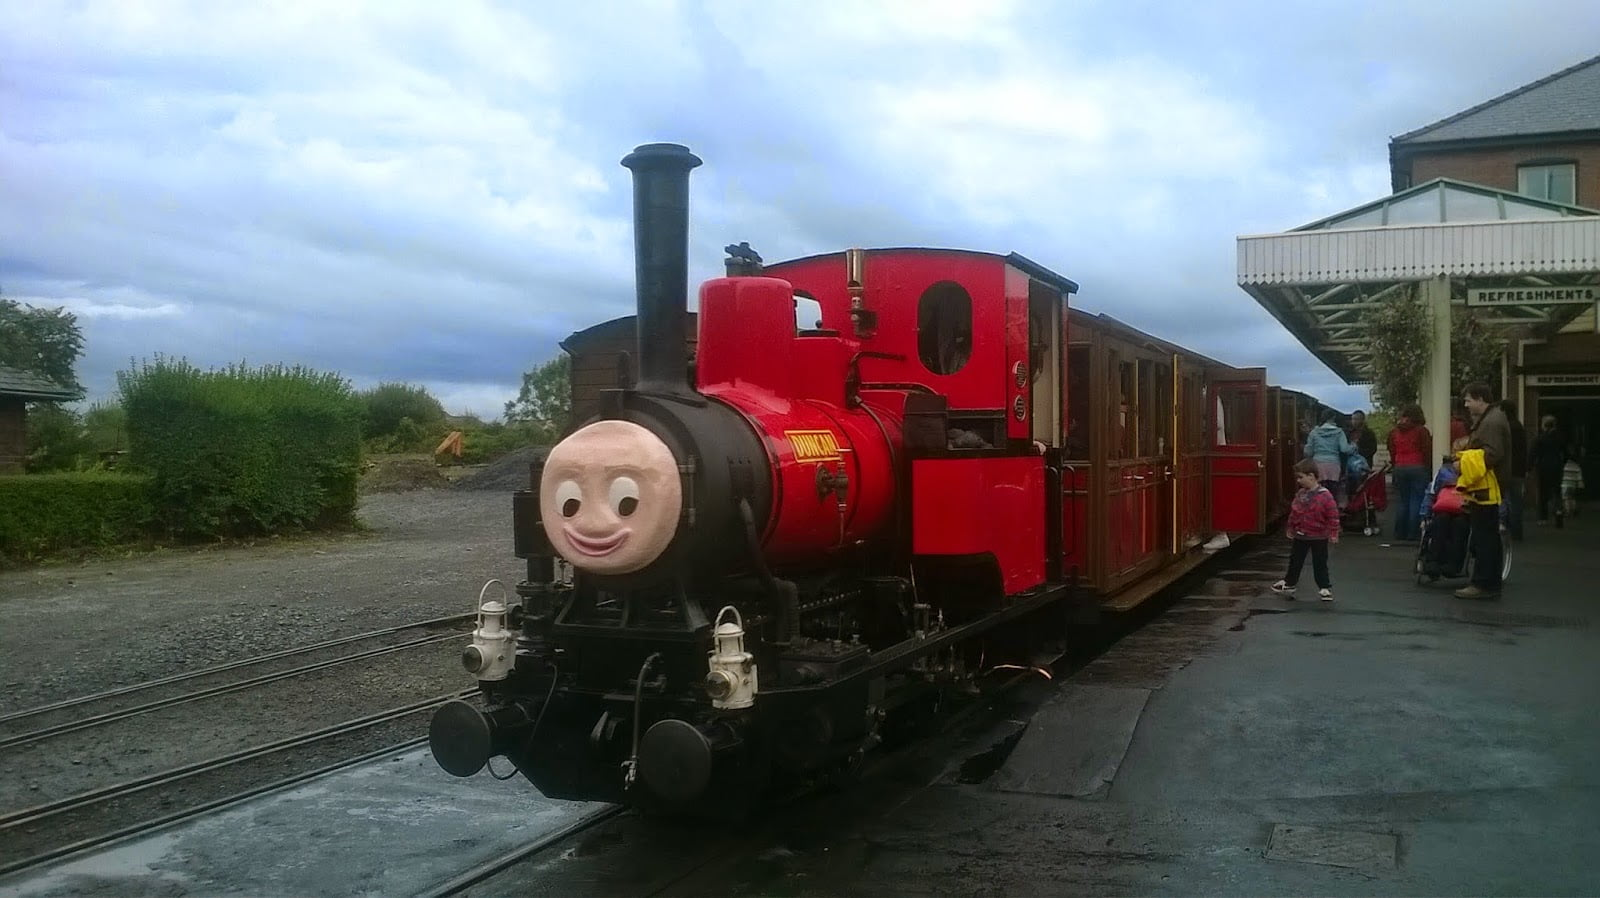 Duncan at Wharf Station on the Talyllyn Railway